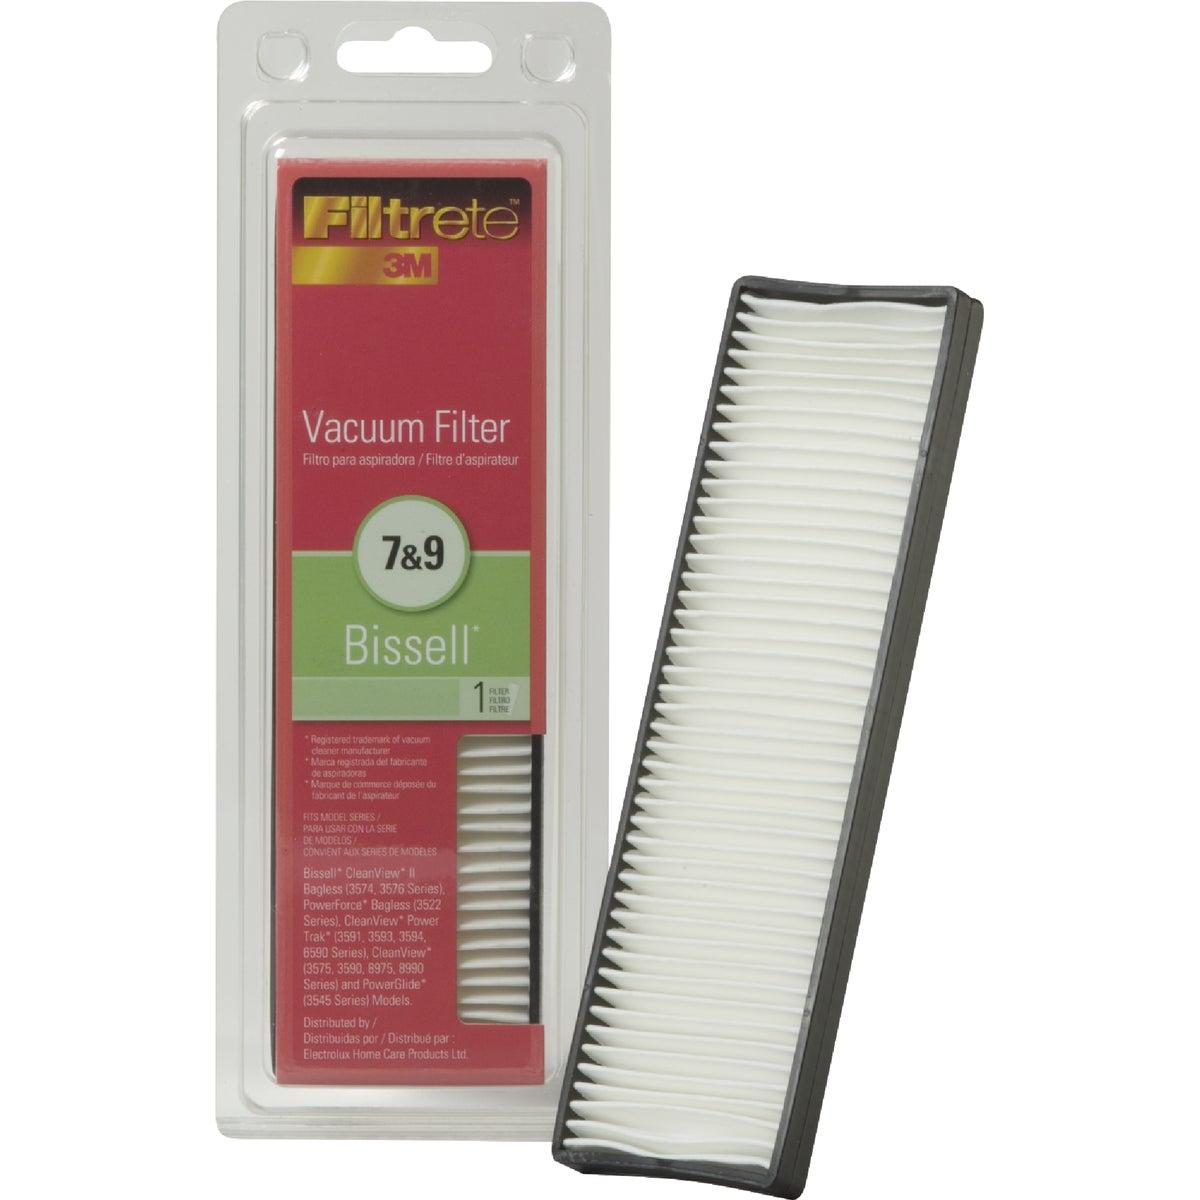 3M Filtrete Bissell 7 & 9 Vacuum Filter